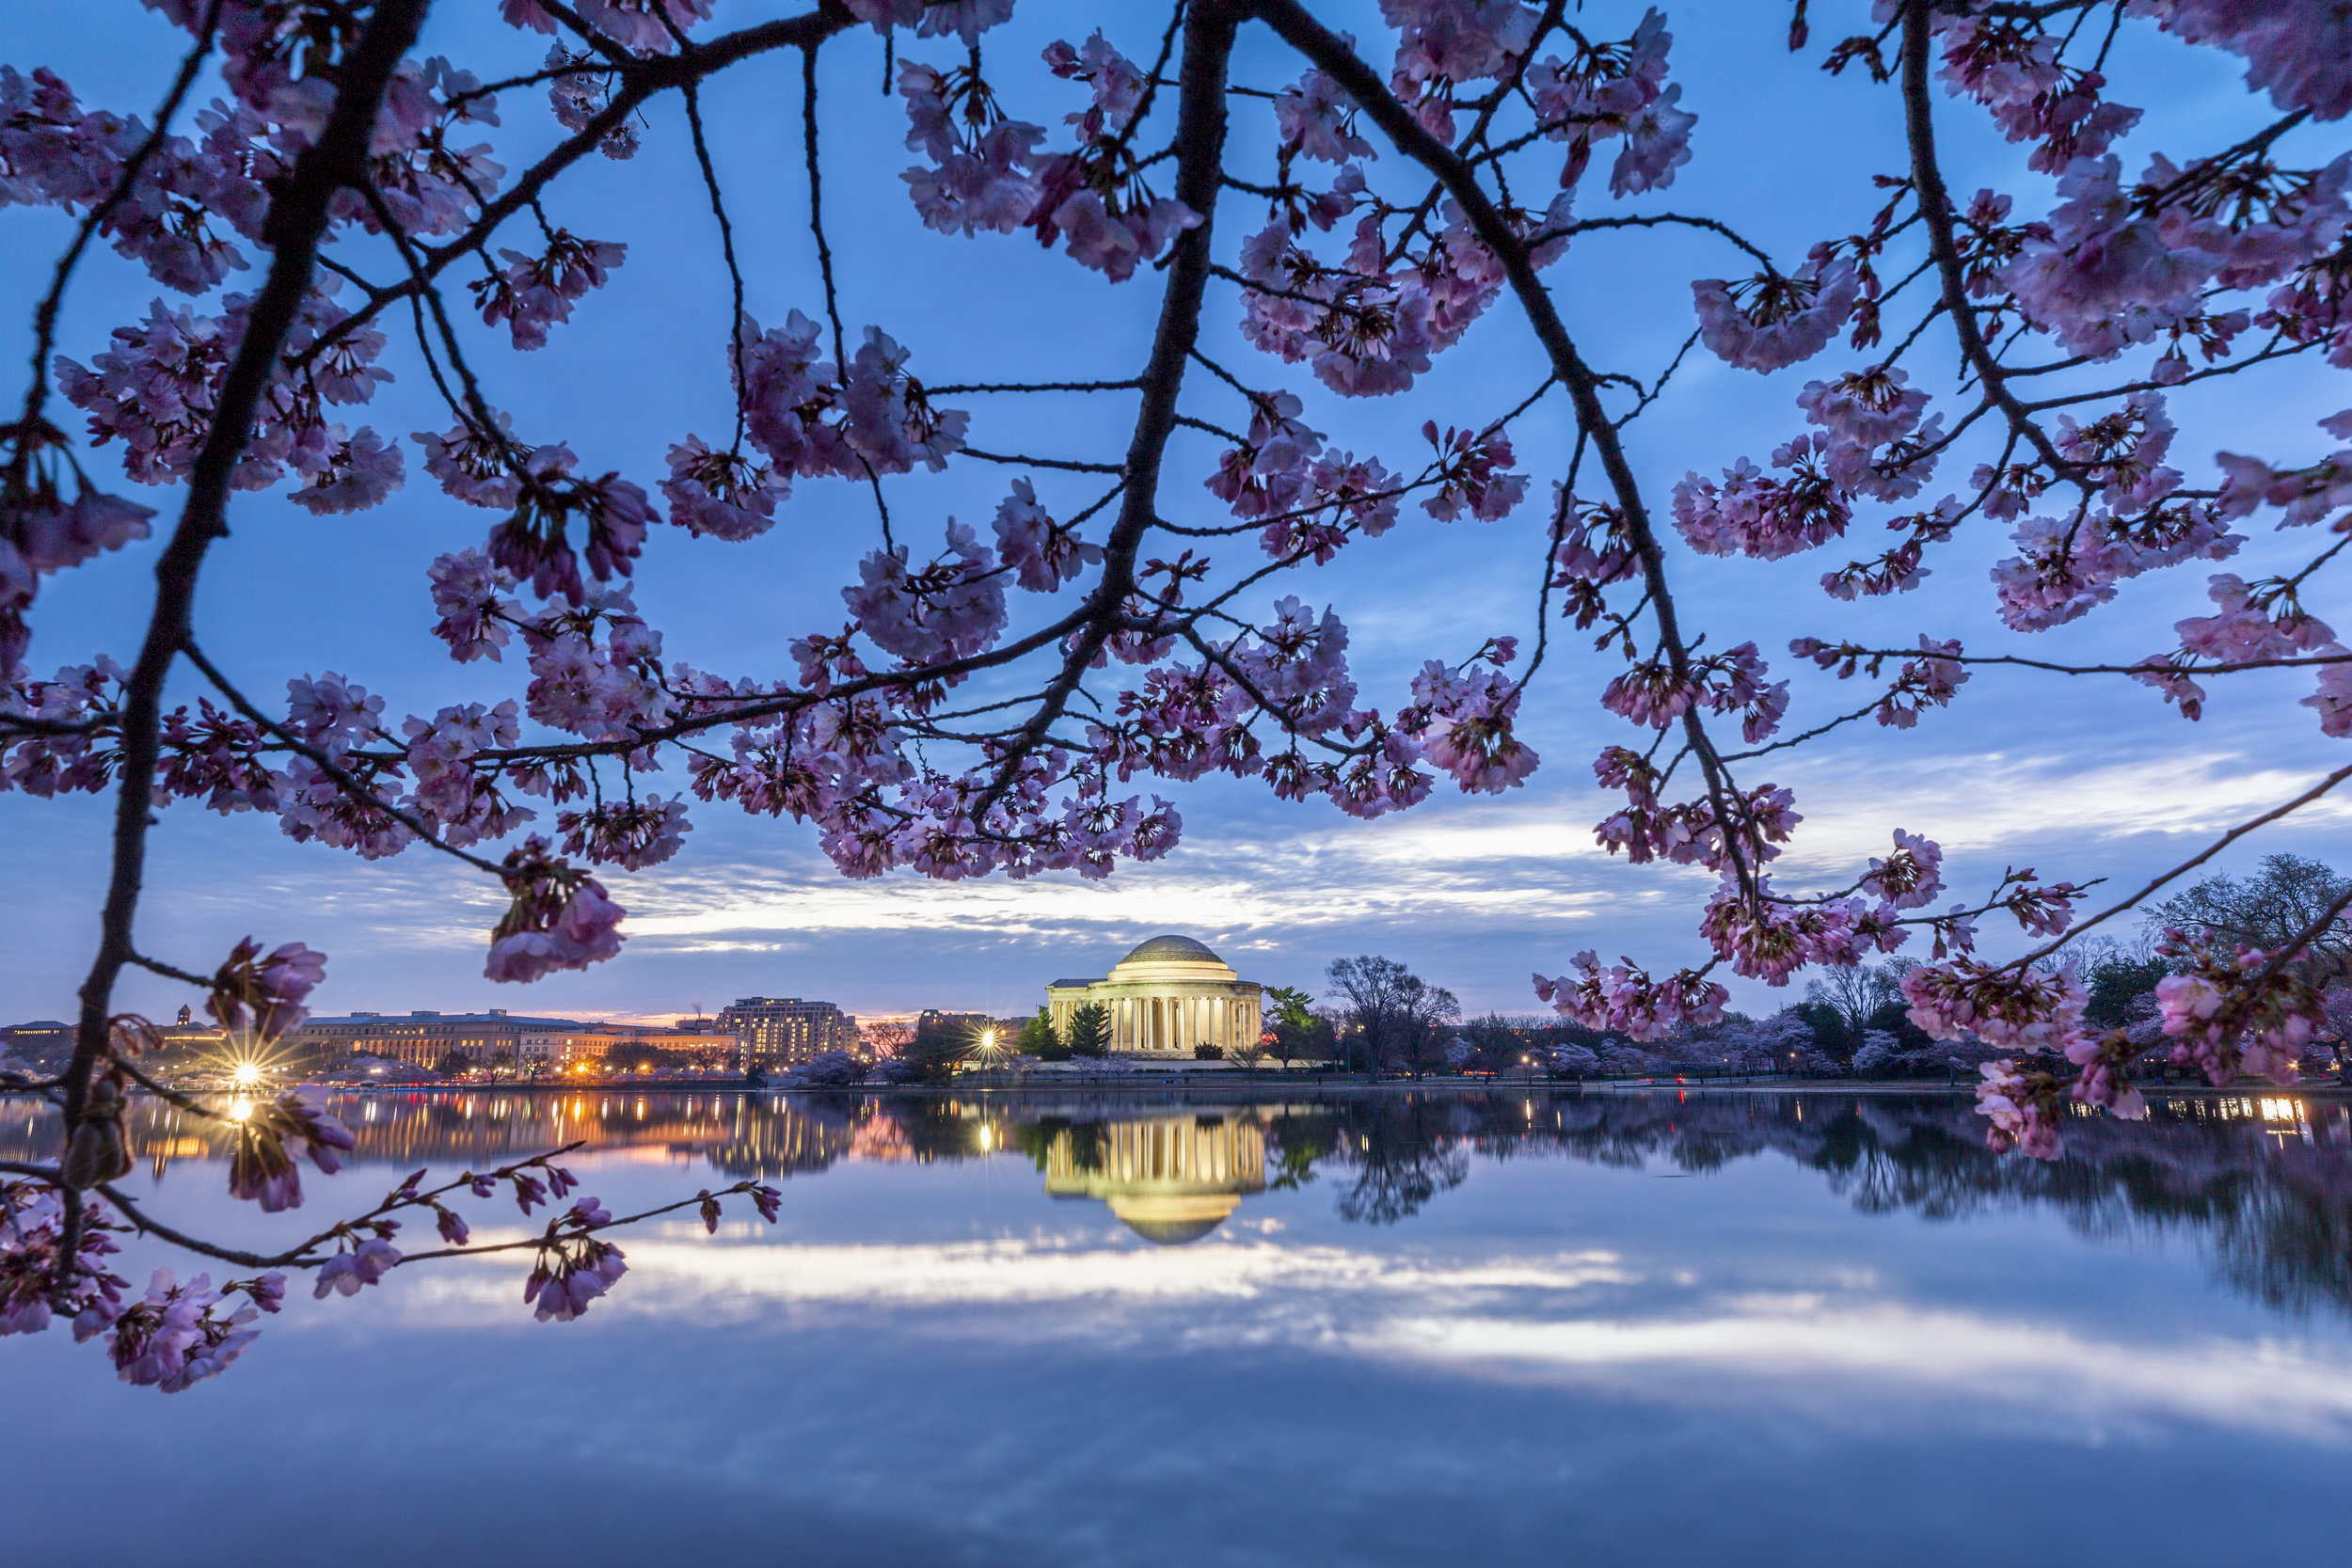 Blossom Sunrise. Washington, D.C. (Mar. 2019)